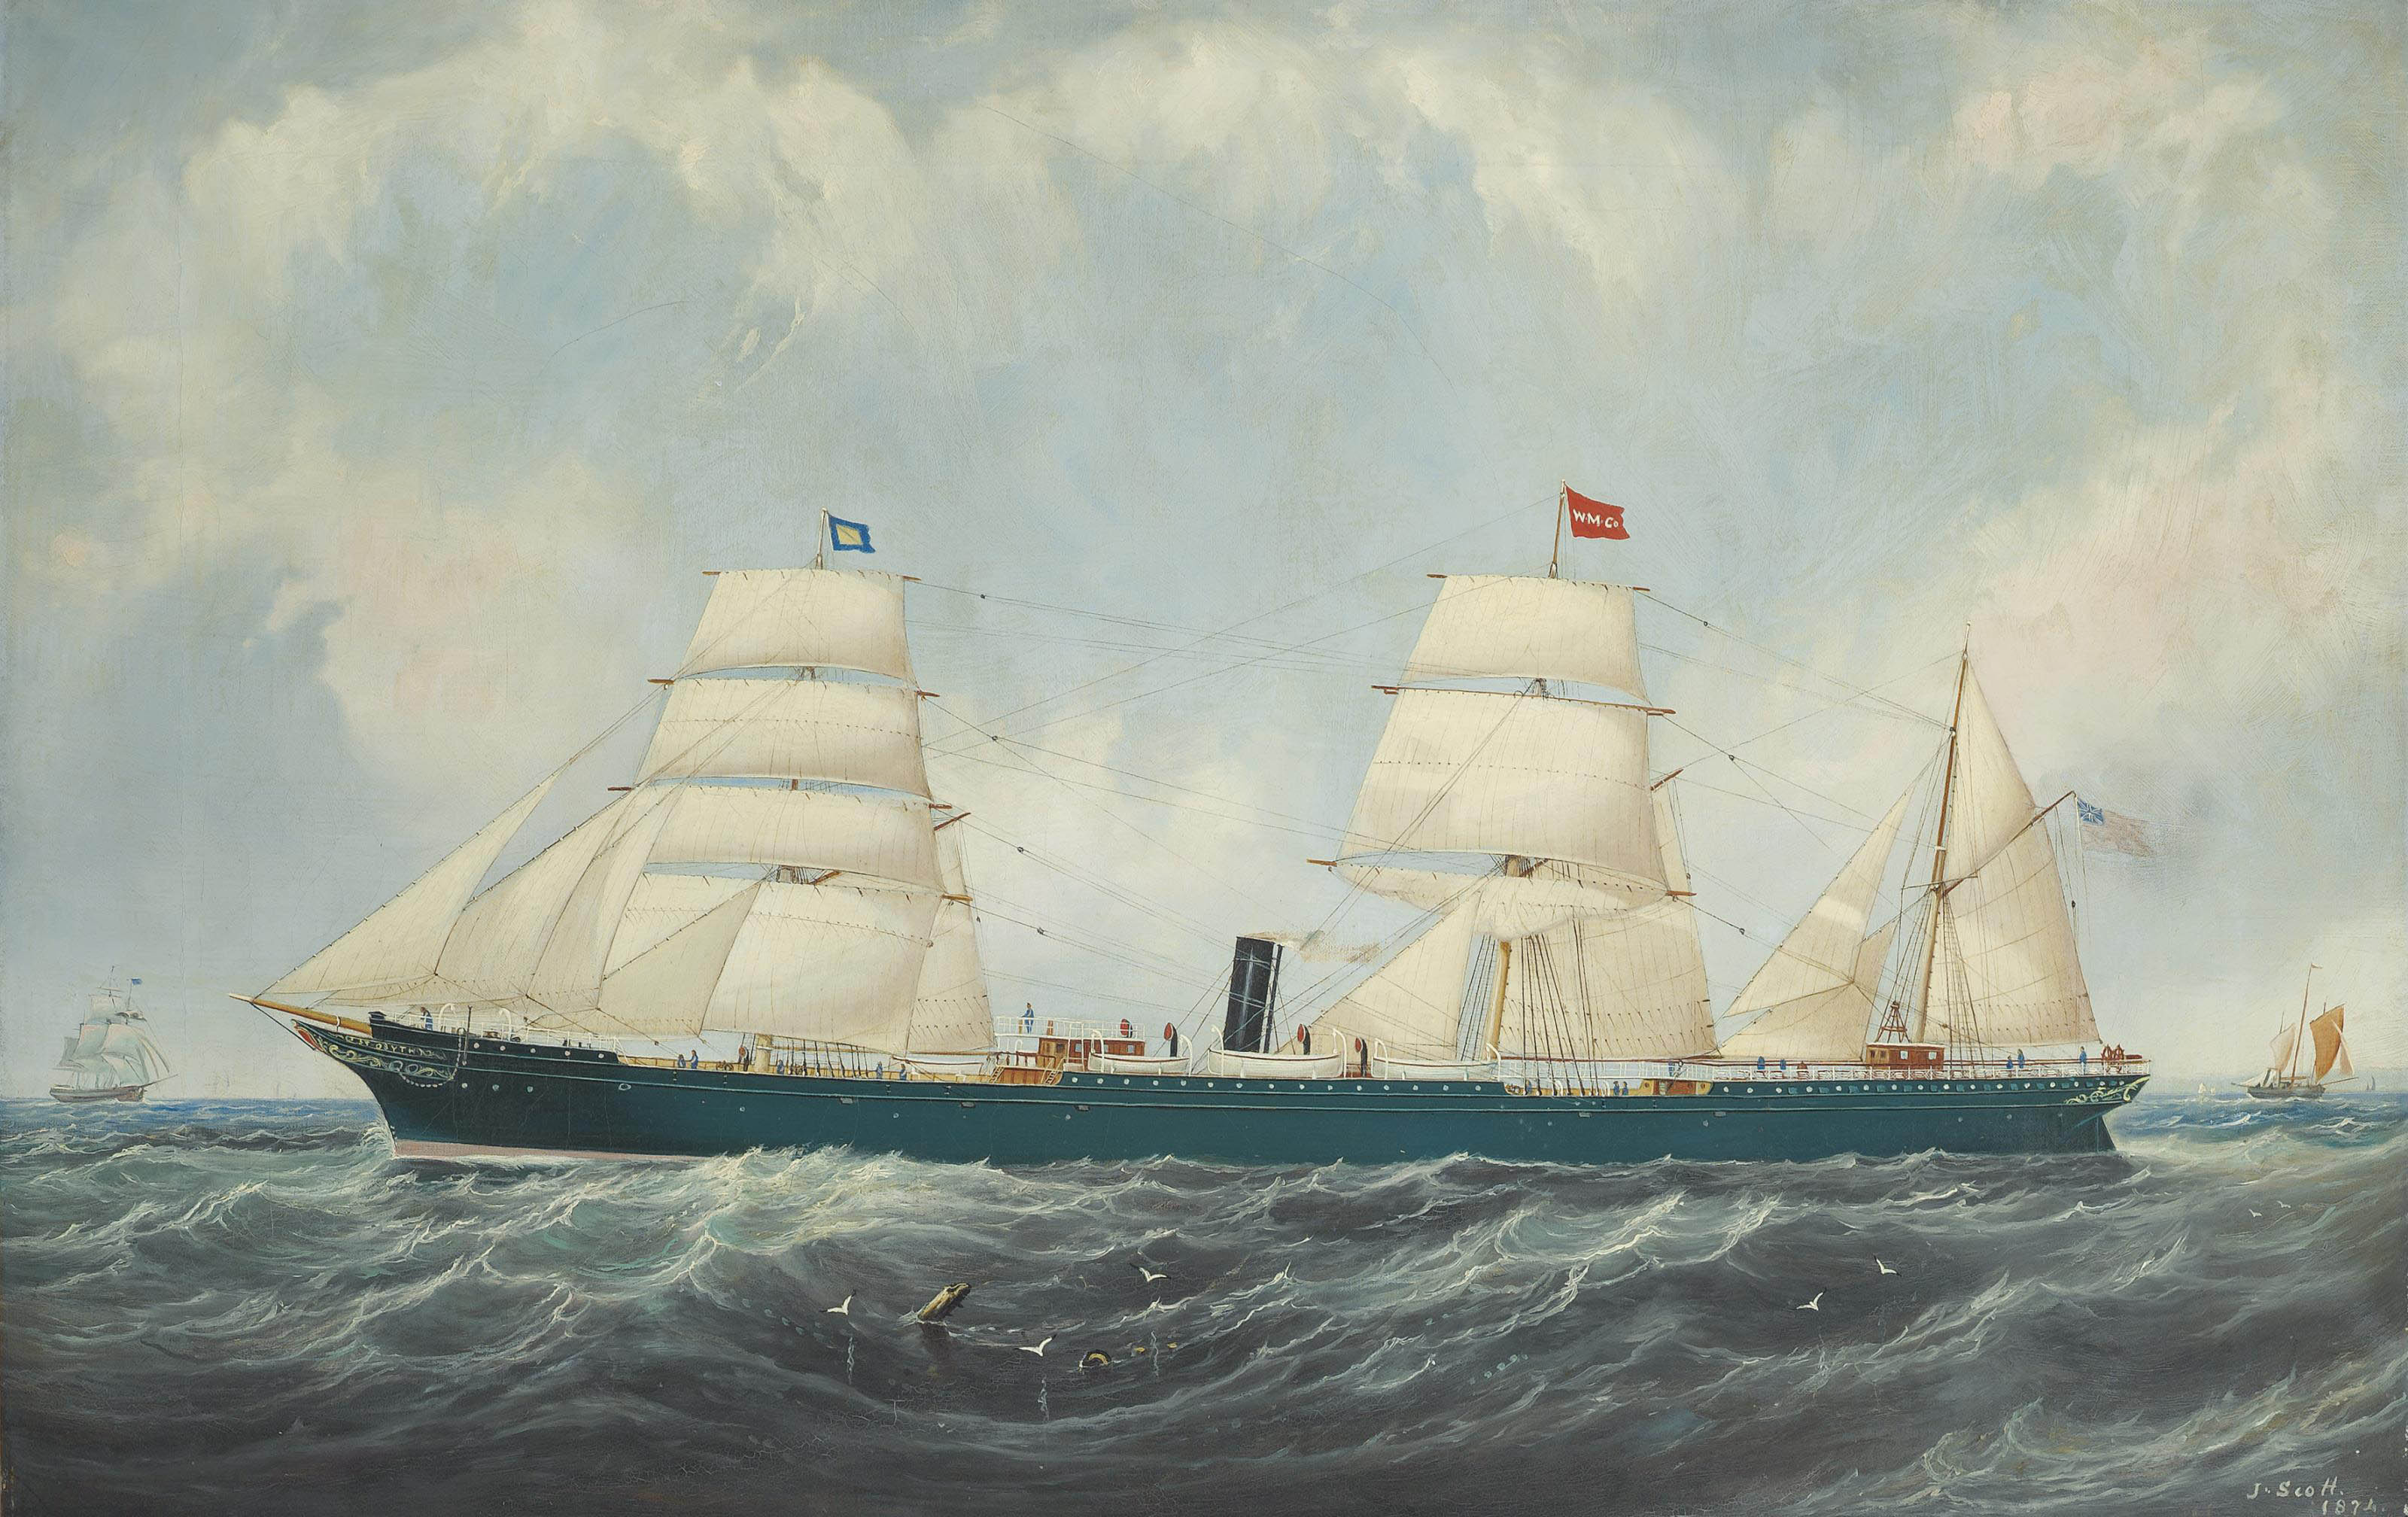 John Scott (1802-1885)